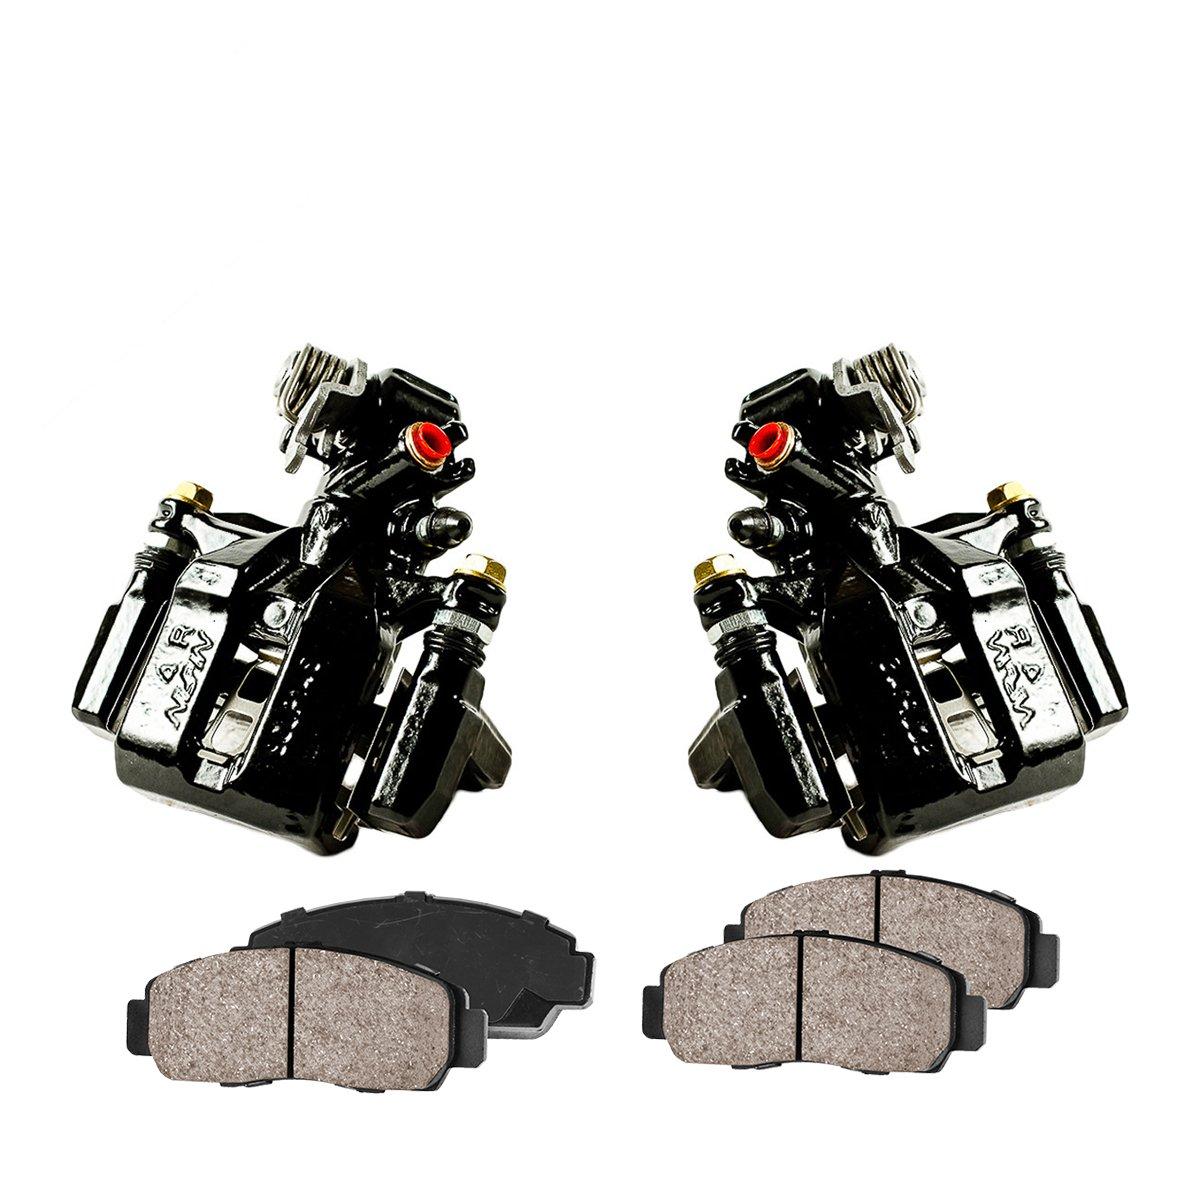 CCK02398 [2] REAR Performance Black Powder Coated Calipers + [4] Quiet Low Dust Ceramic Brake Pads Callahan Brake Parts